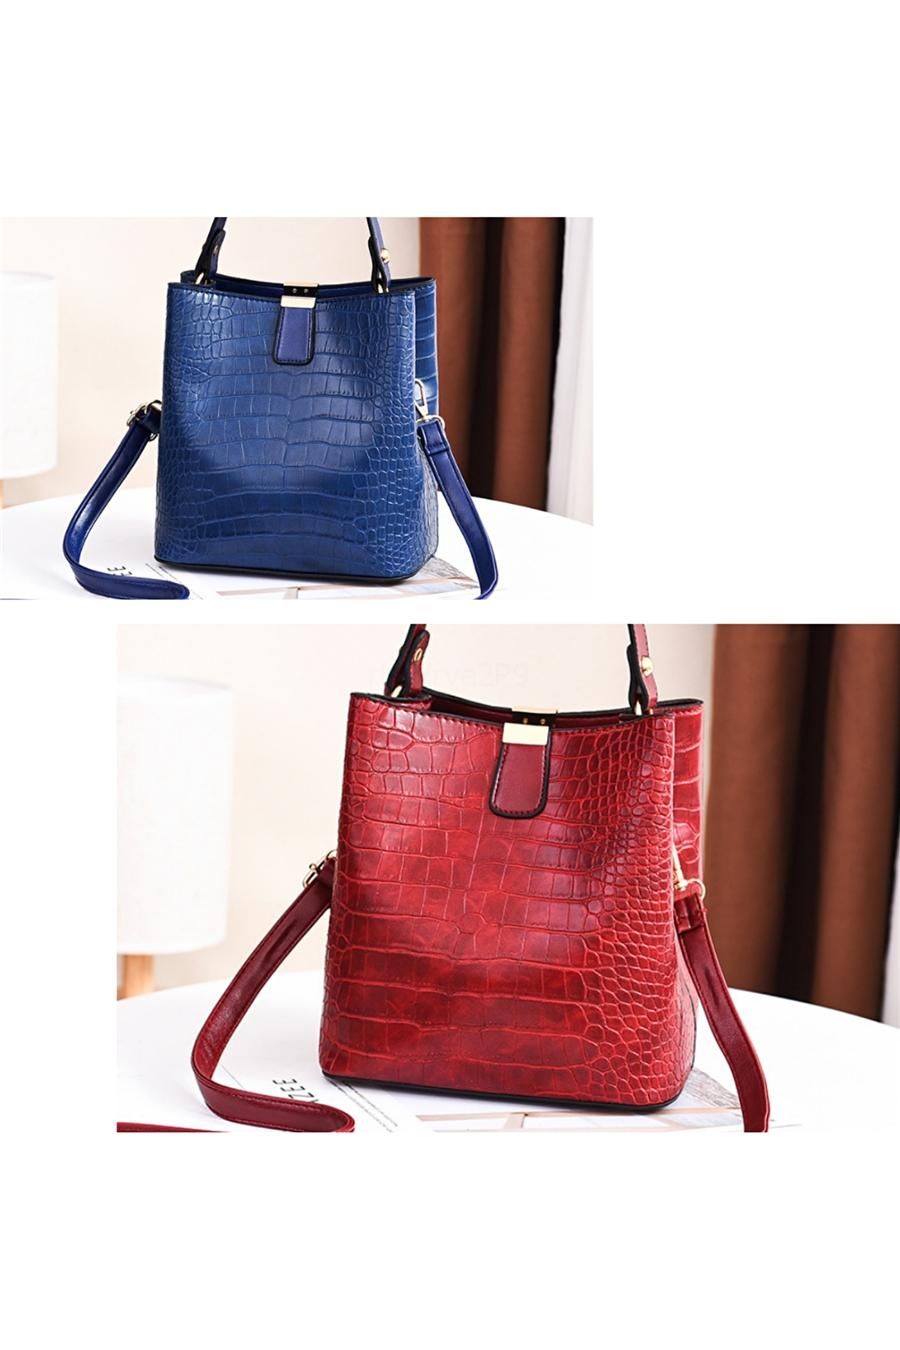 JIEROTYX Leather Shoulder Bags For Women New Fashion Exquisite HandBag Ladies Huge Golden Chain Decoration Women Bag#515